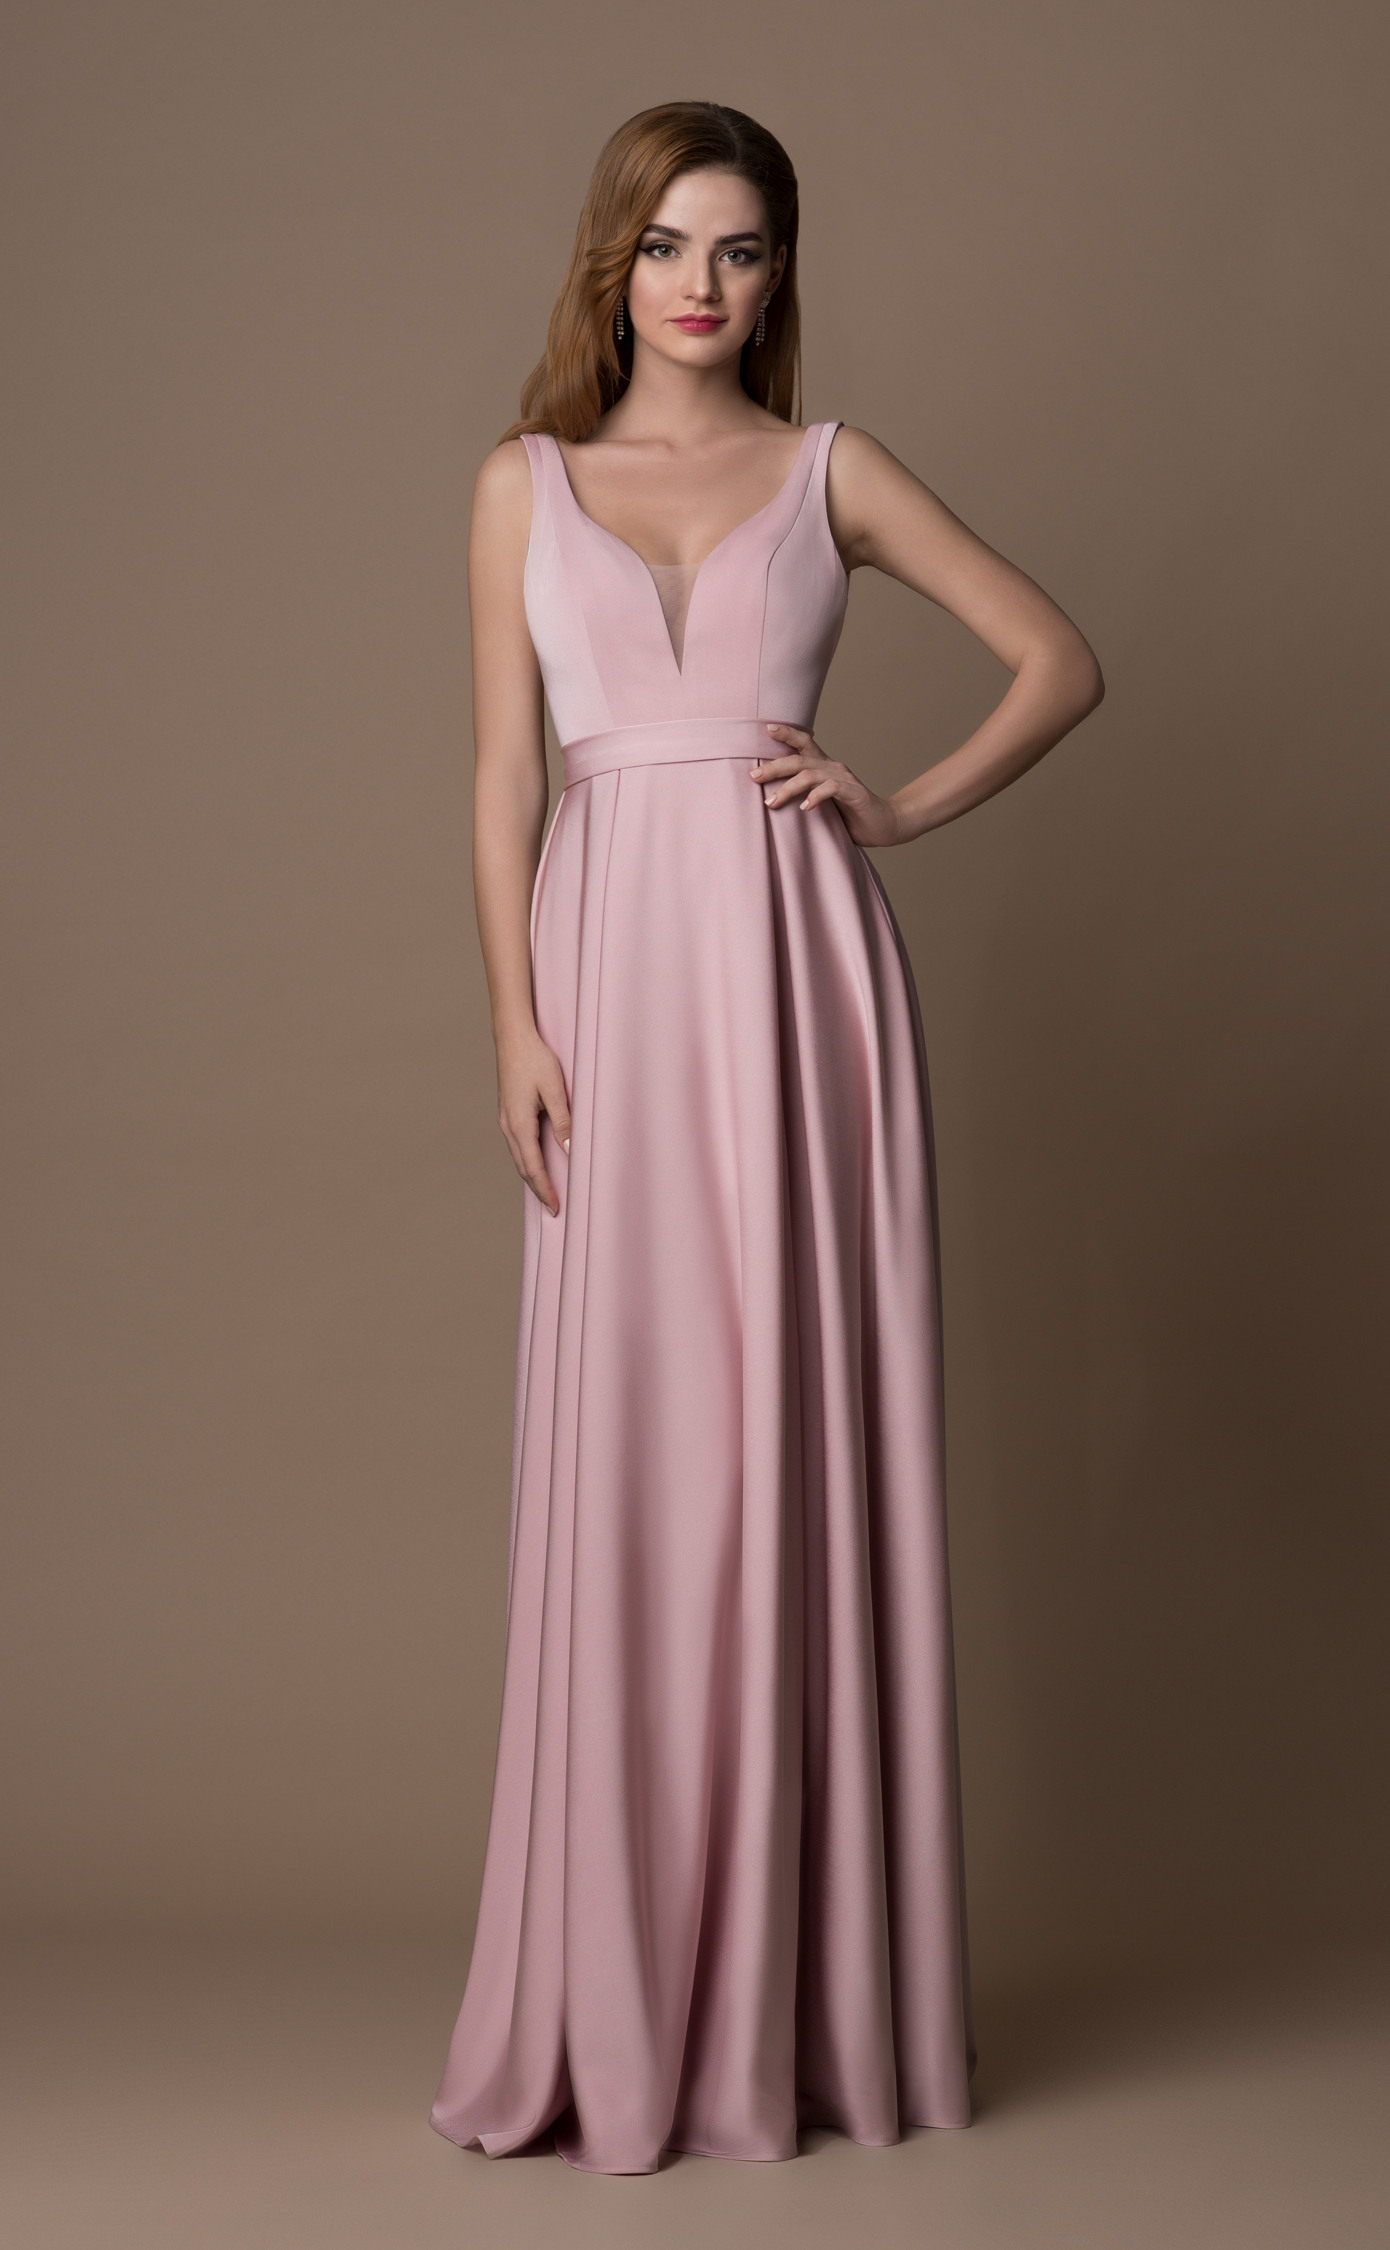 Cool Abendkleid Altrosa Galerie13 Fantastisch Abendkleid Altrosa Vertrieb